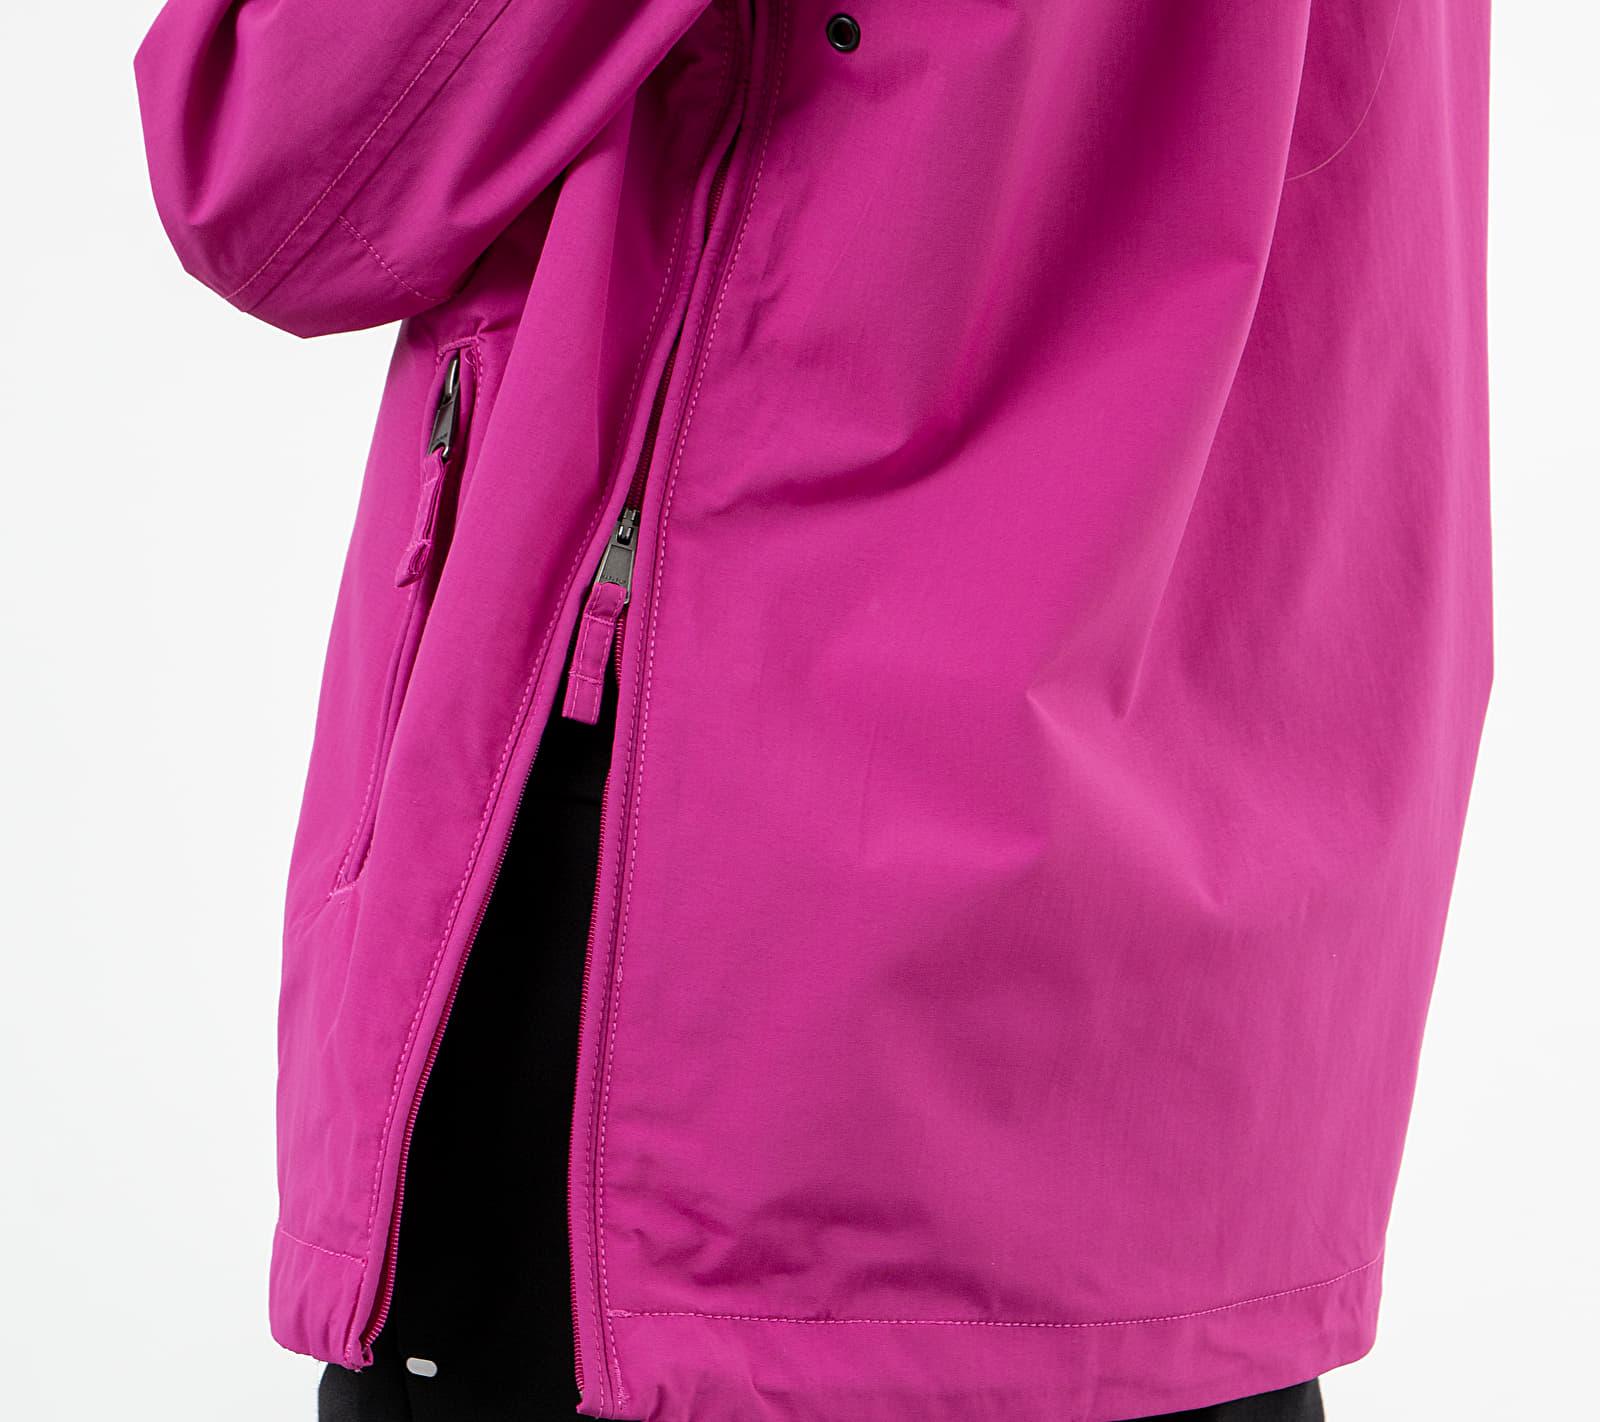 Napapijri Rainforest Summer Pocket Jacket Clover Purple